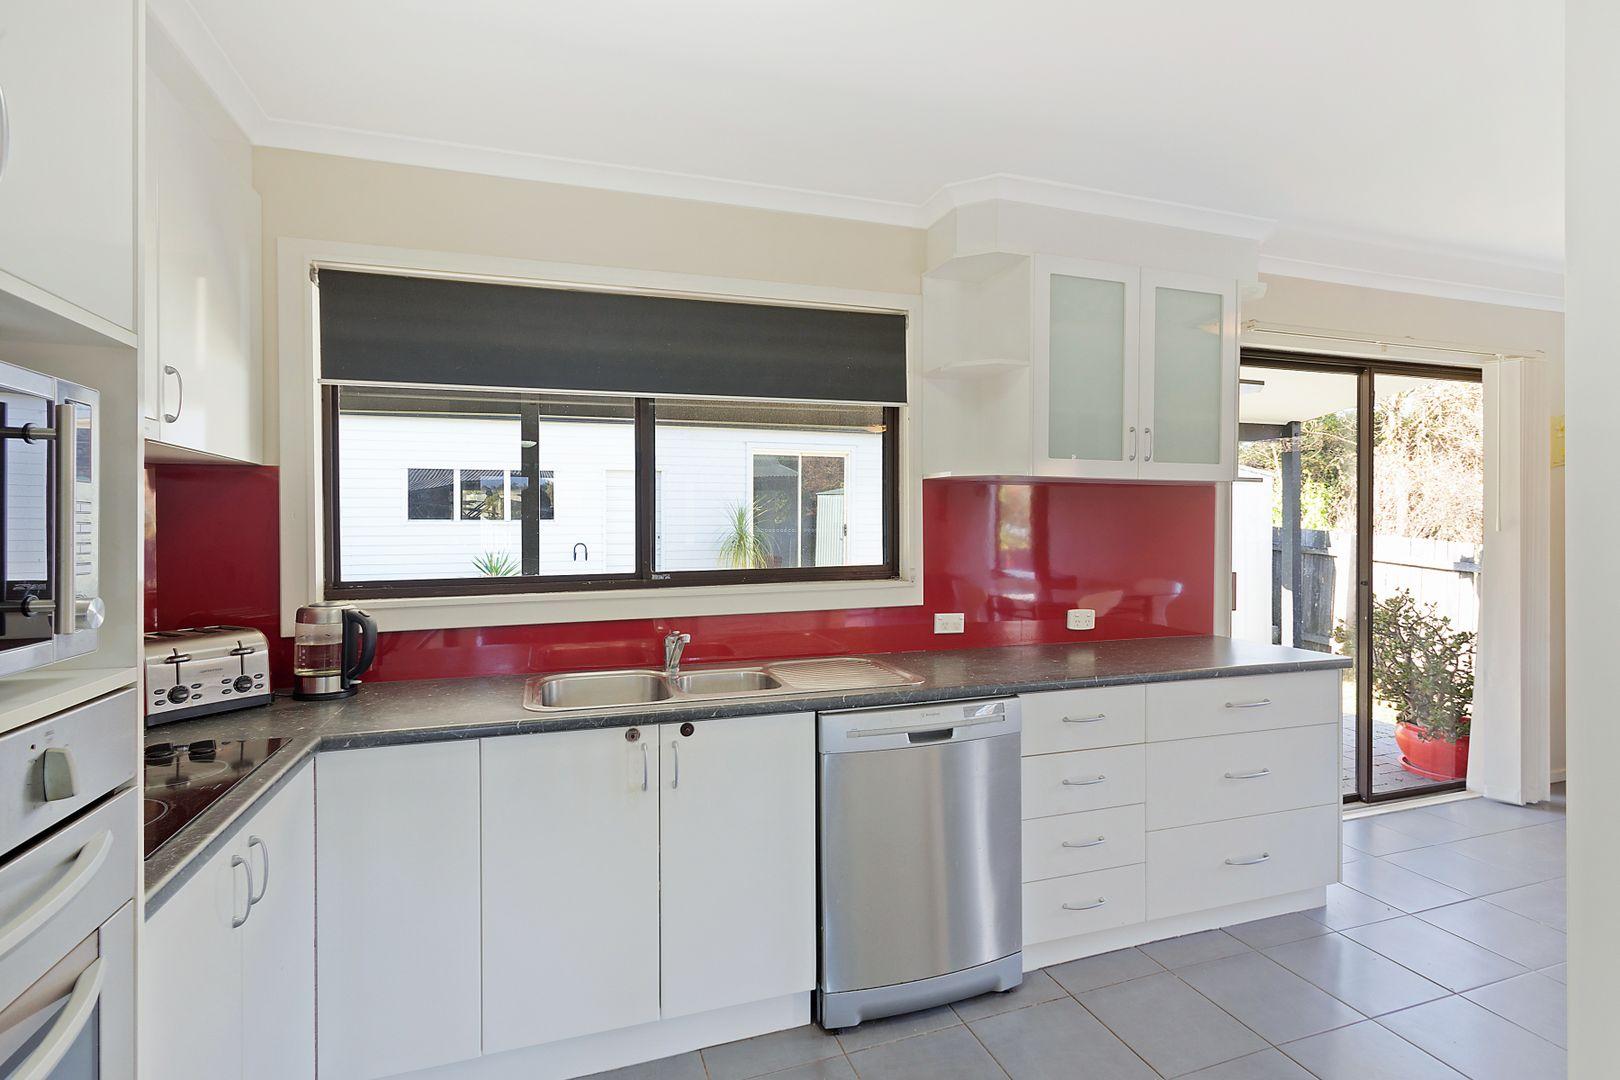 13 Hoyer Street, Cobargo NSW 2550, Image 1